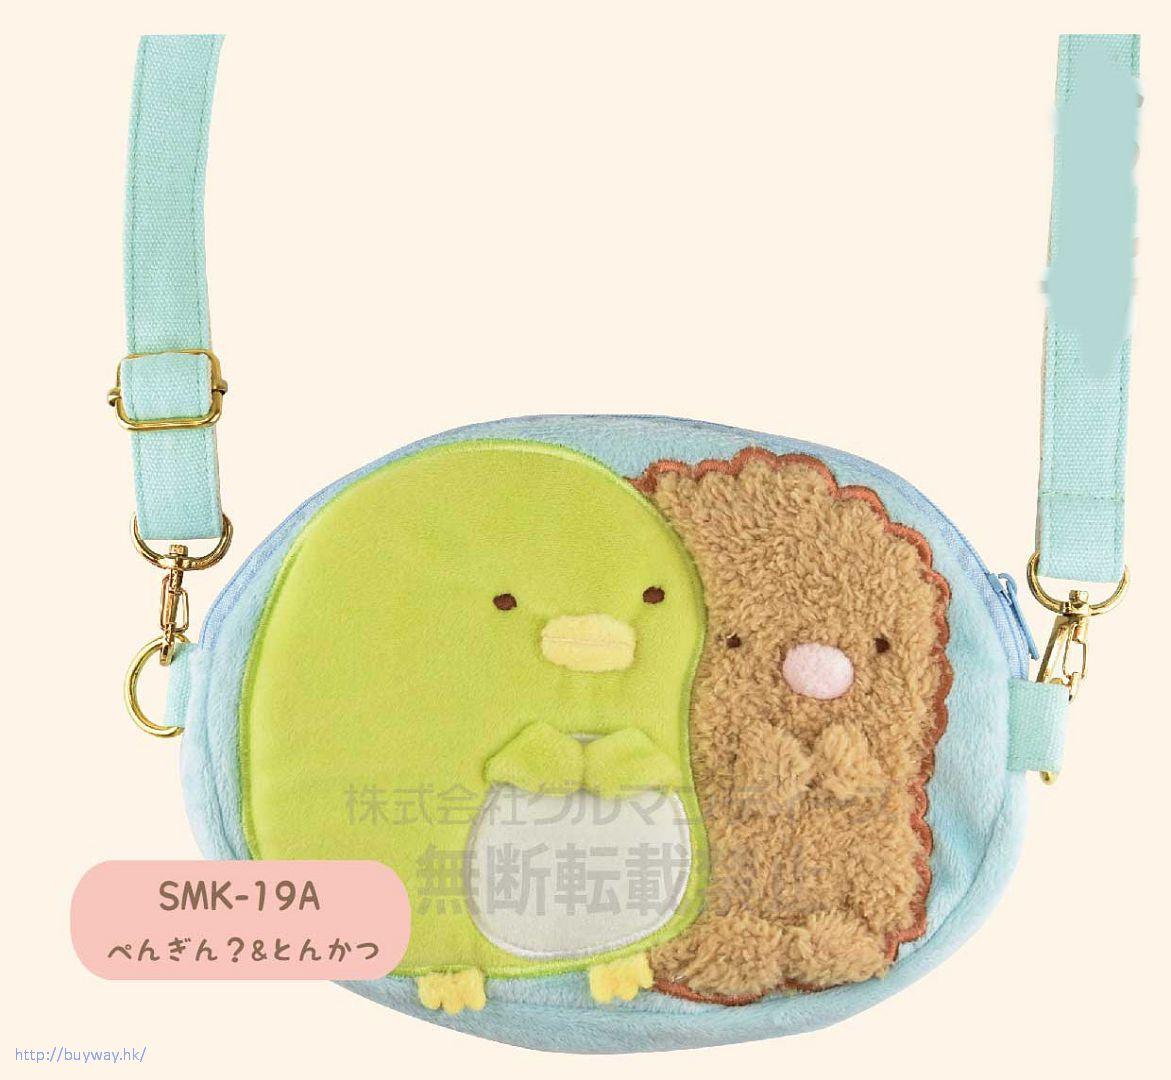 角落生物 「企鵝 + 炸豬排」手機袋 Smartphone Bag Penguin & Tonkatsu SMK-19A【Sumikko Gurashi】